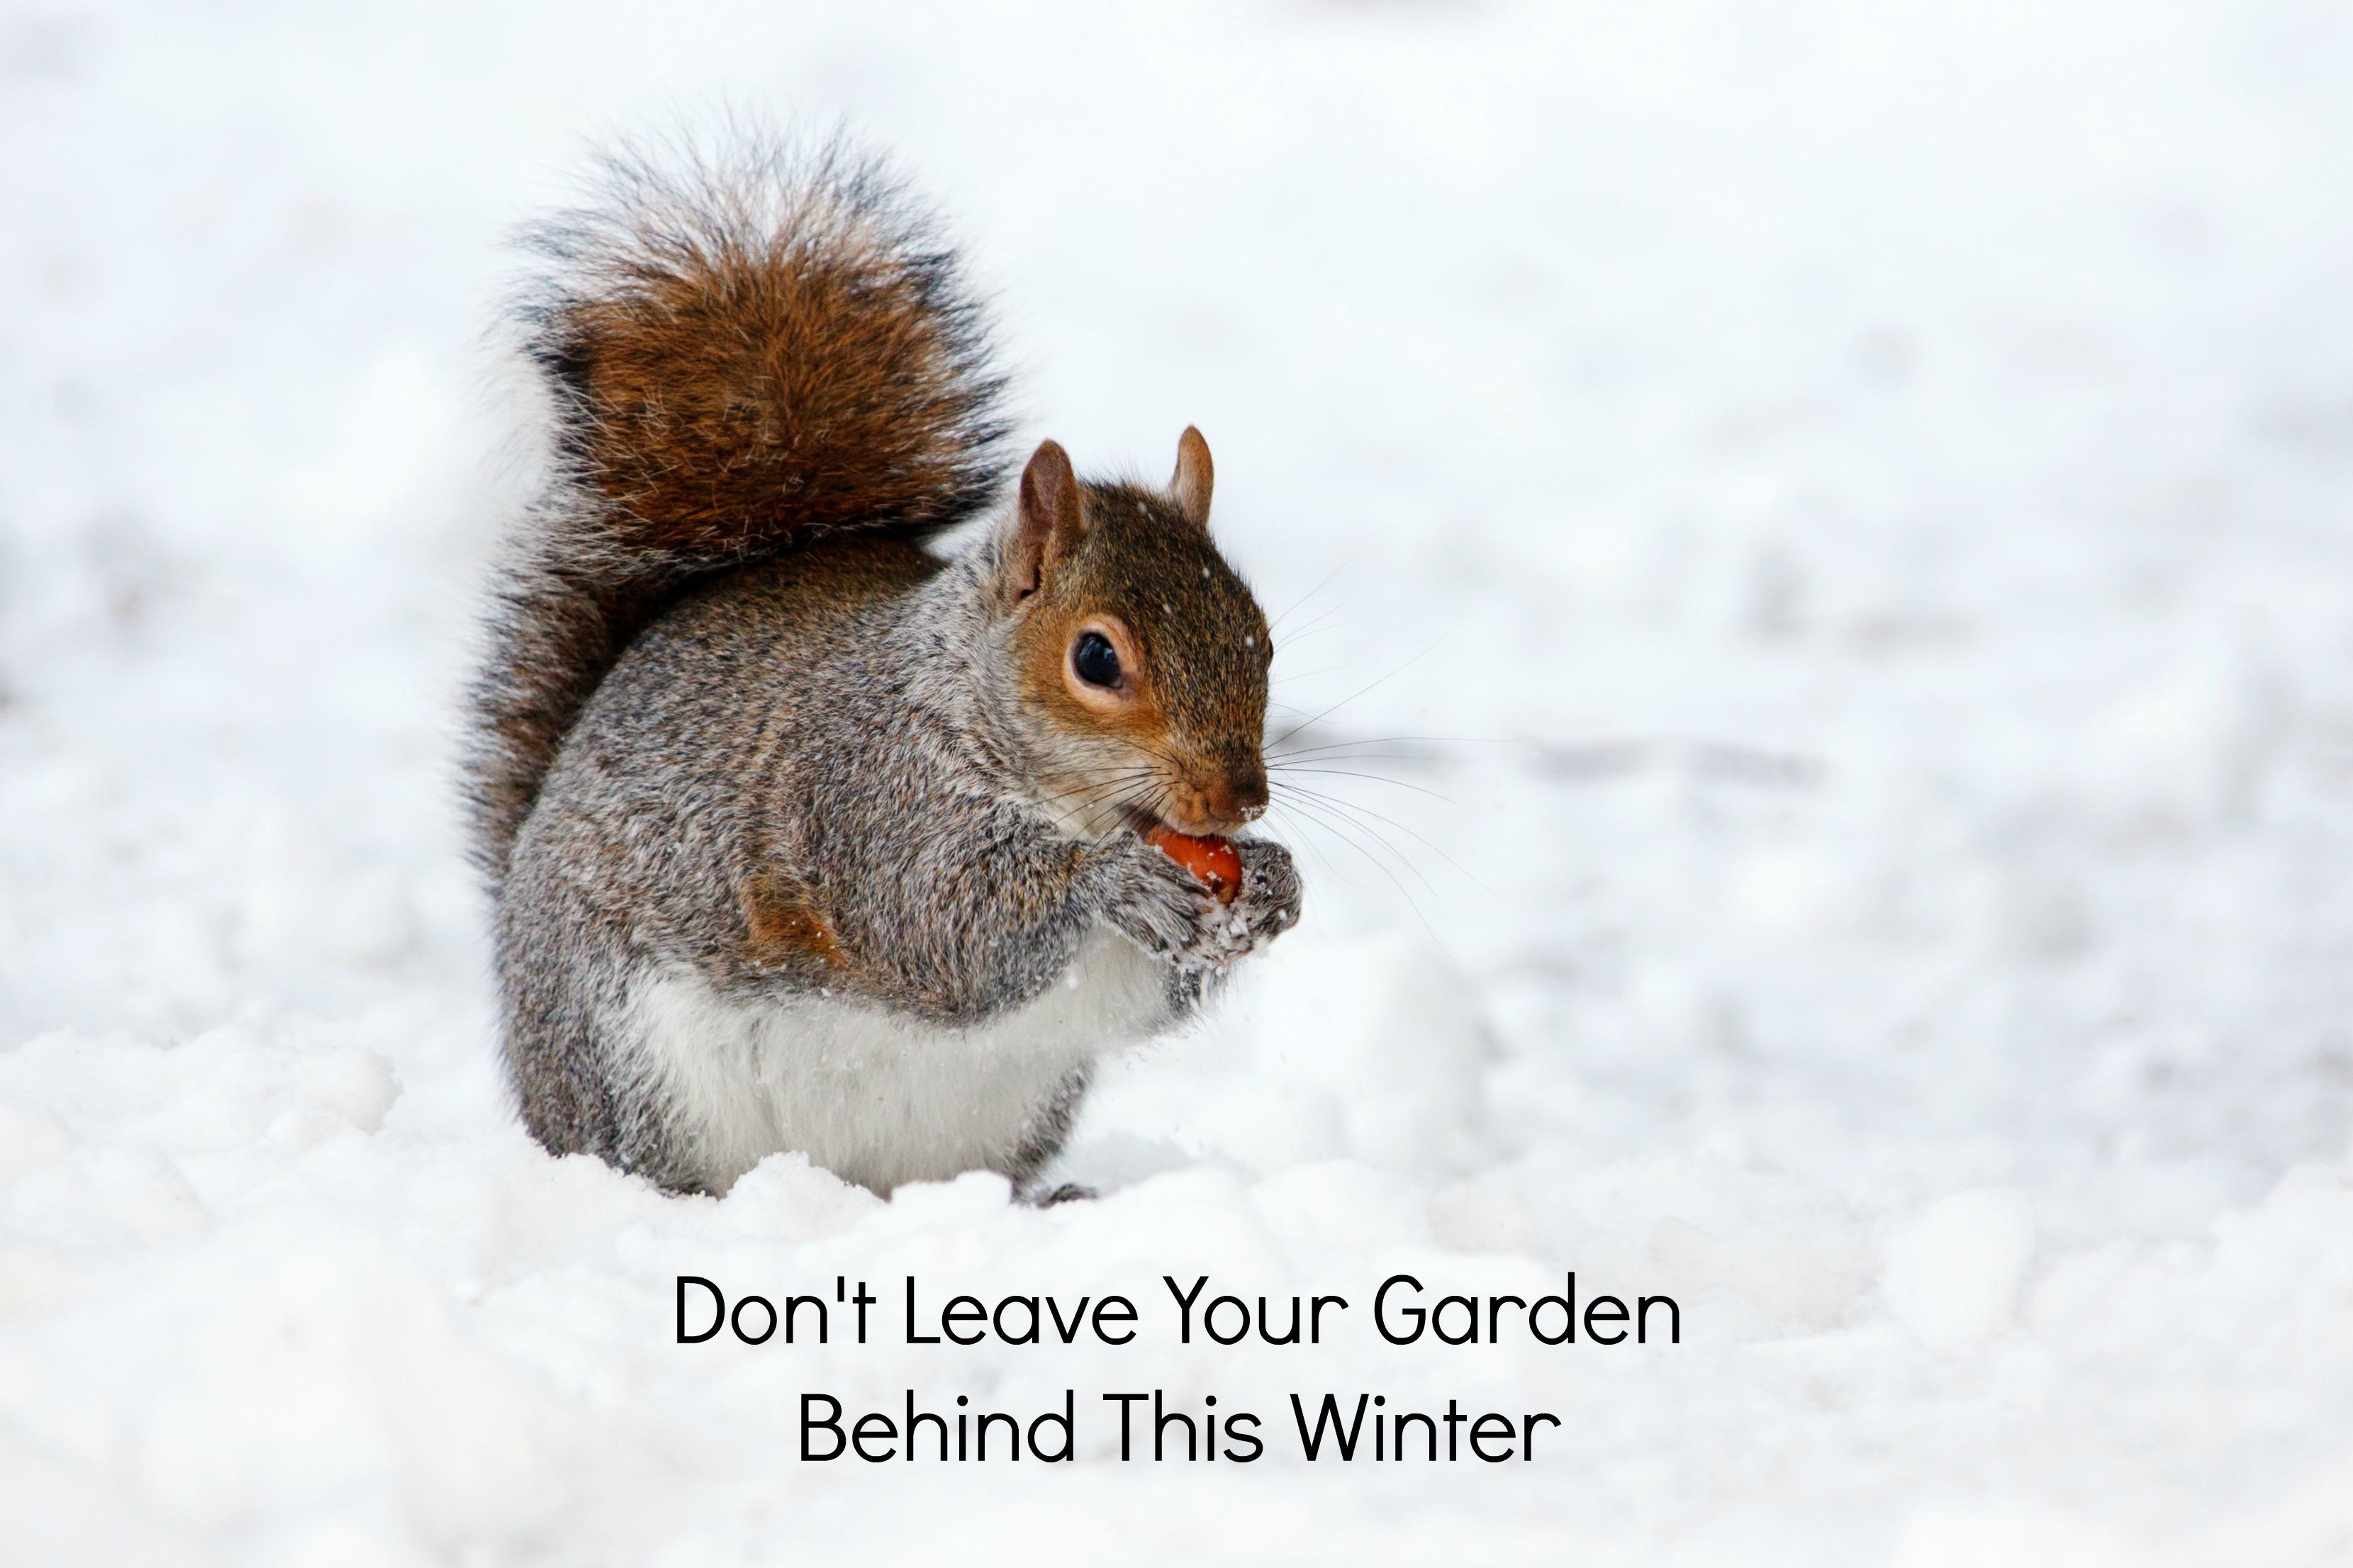 squirrel, snow, squirrel eating nut, squirrel in snow